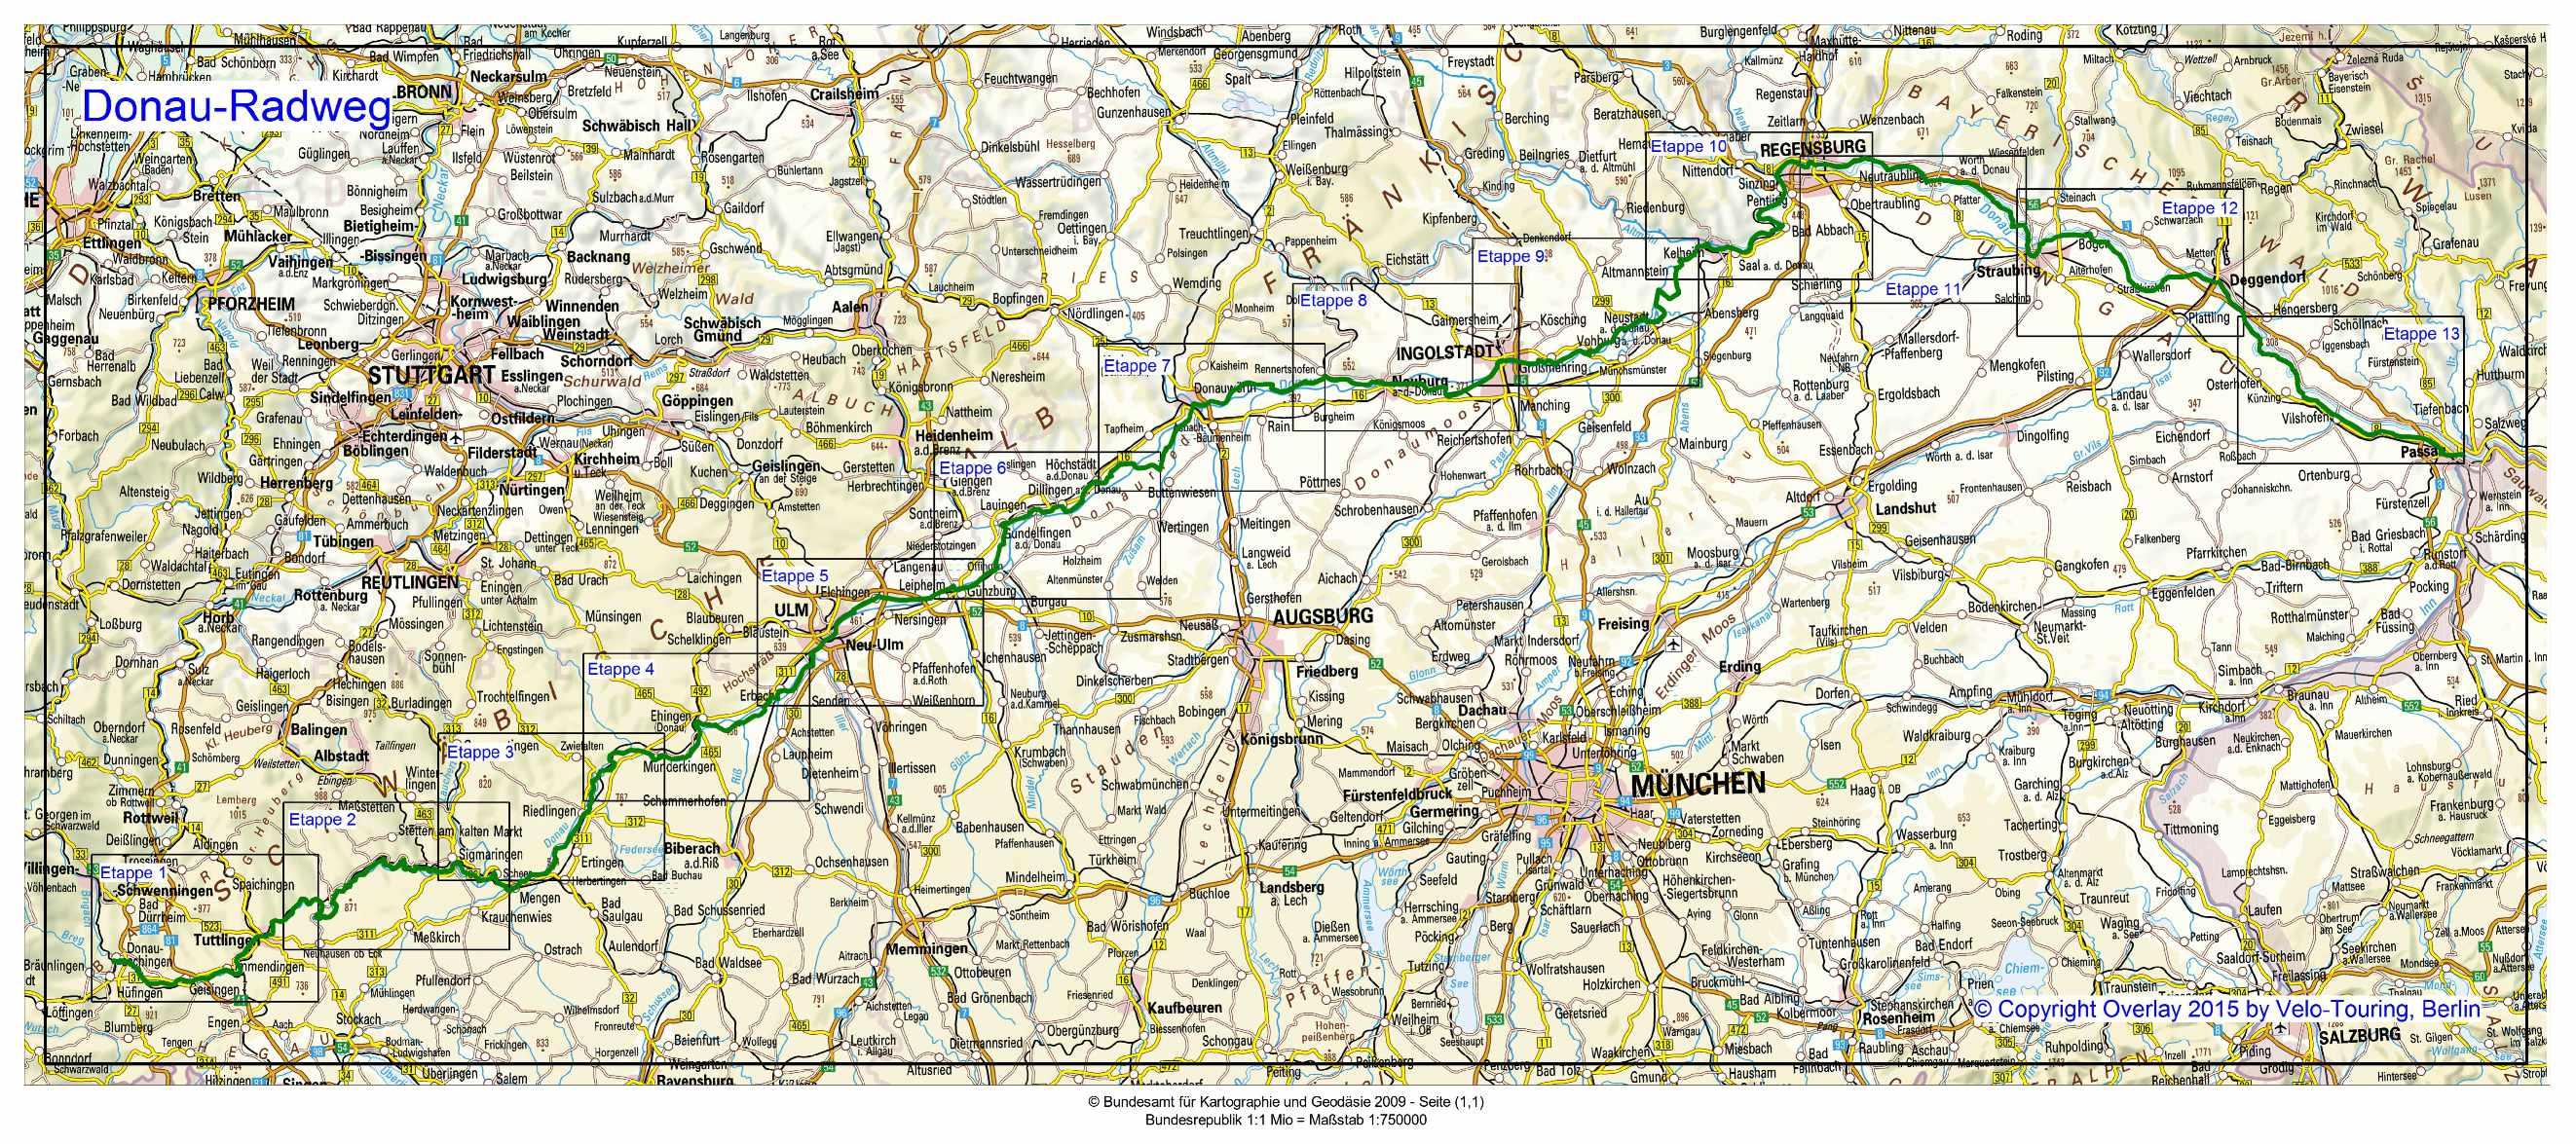 donau radweg karte Velo Touring   Reiseführer :: Donau Radweg von Donaueschingen nach